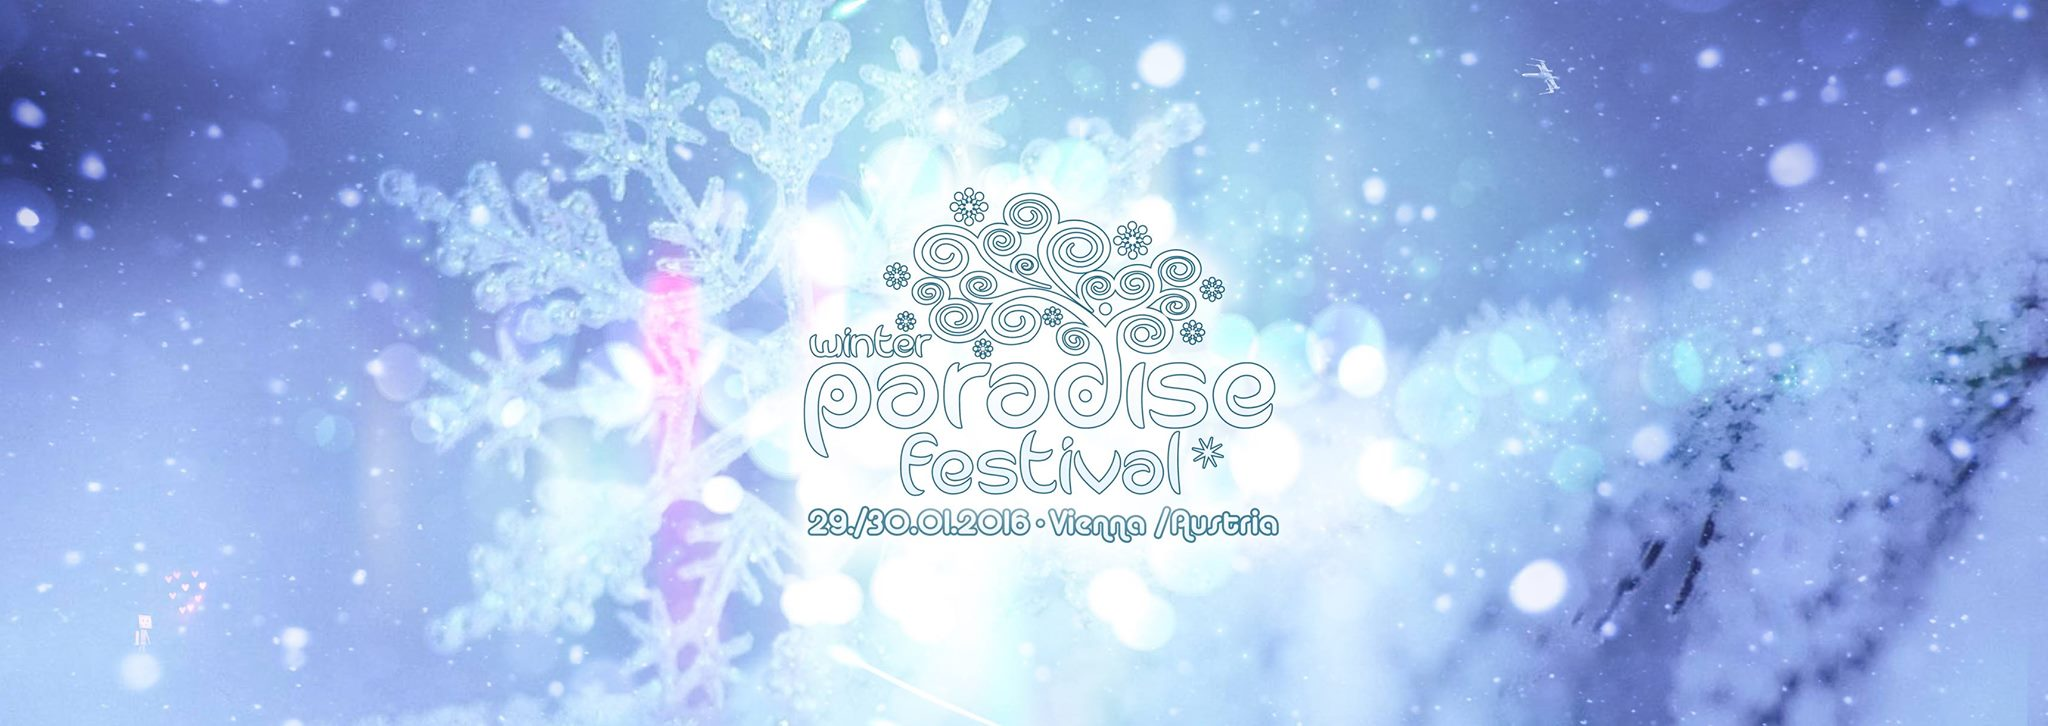 Paradise Winter Festival 2016